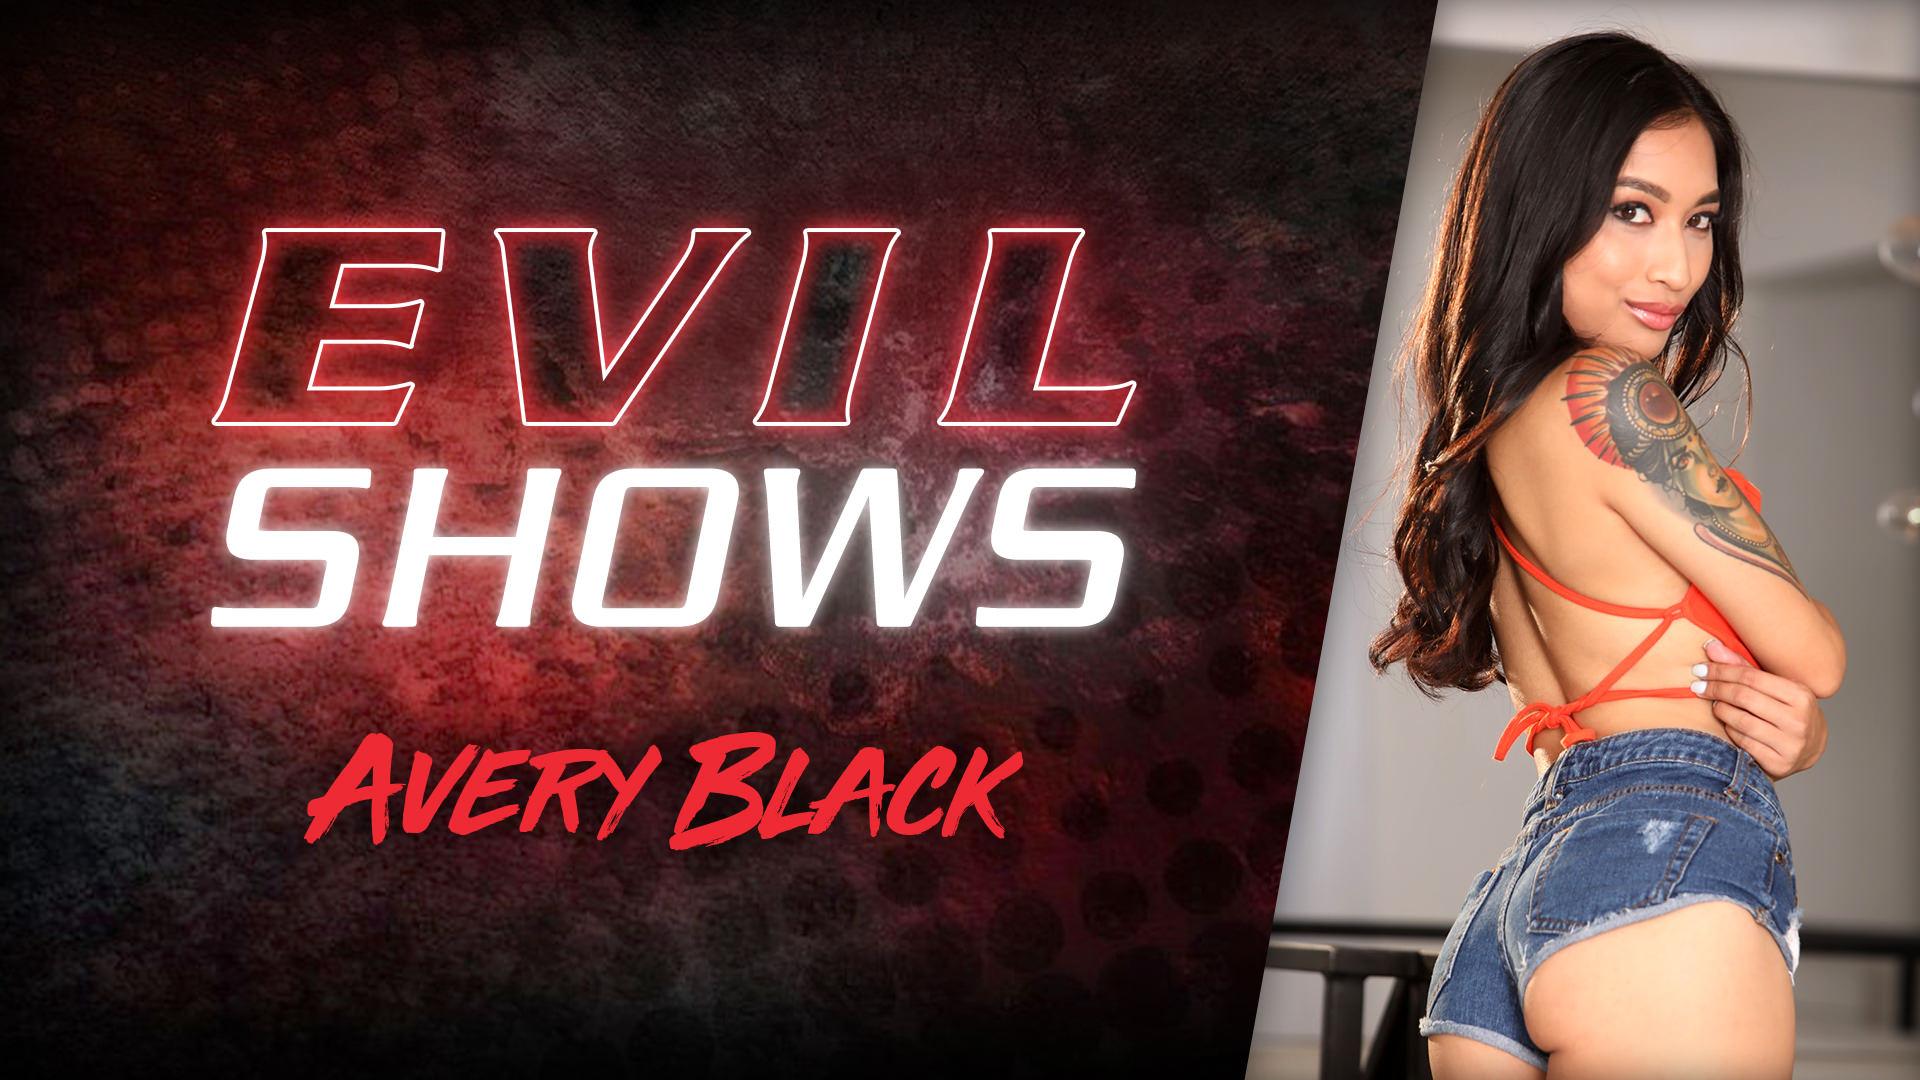 Evil Shows - Avery Black - Avery Black 1